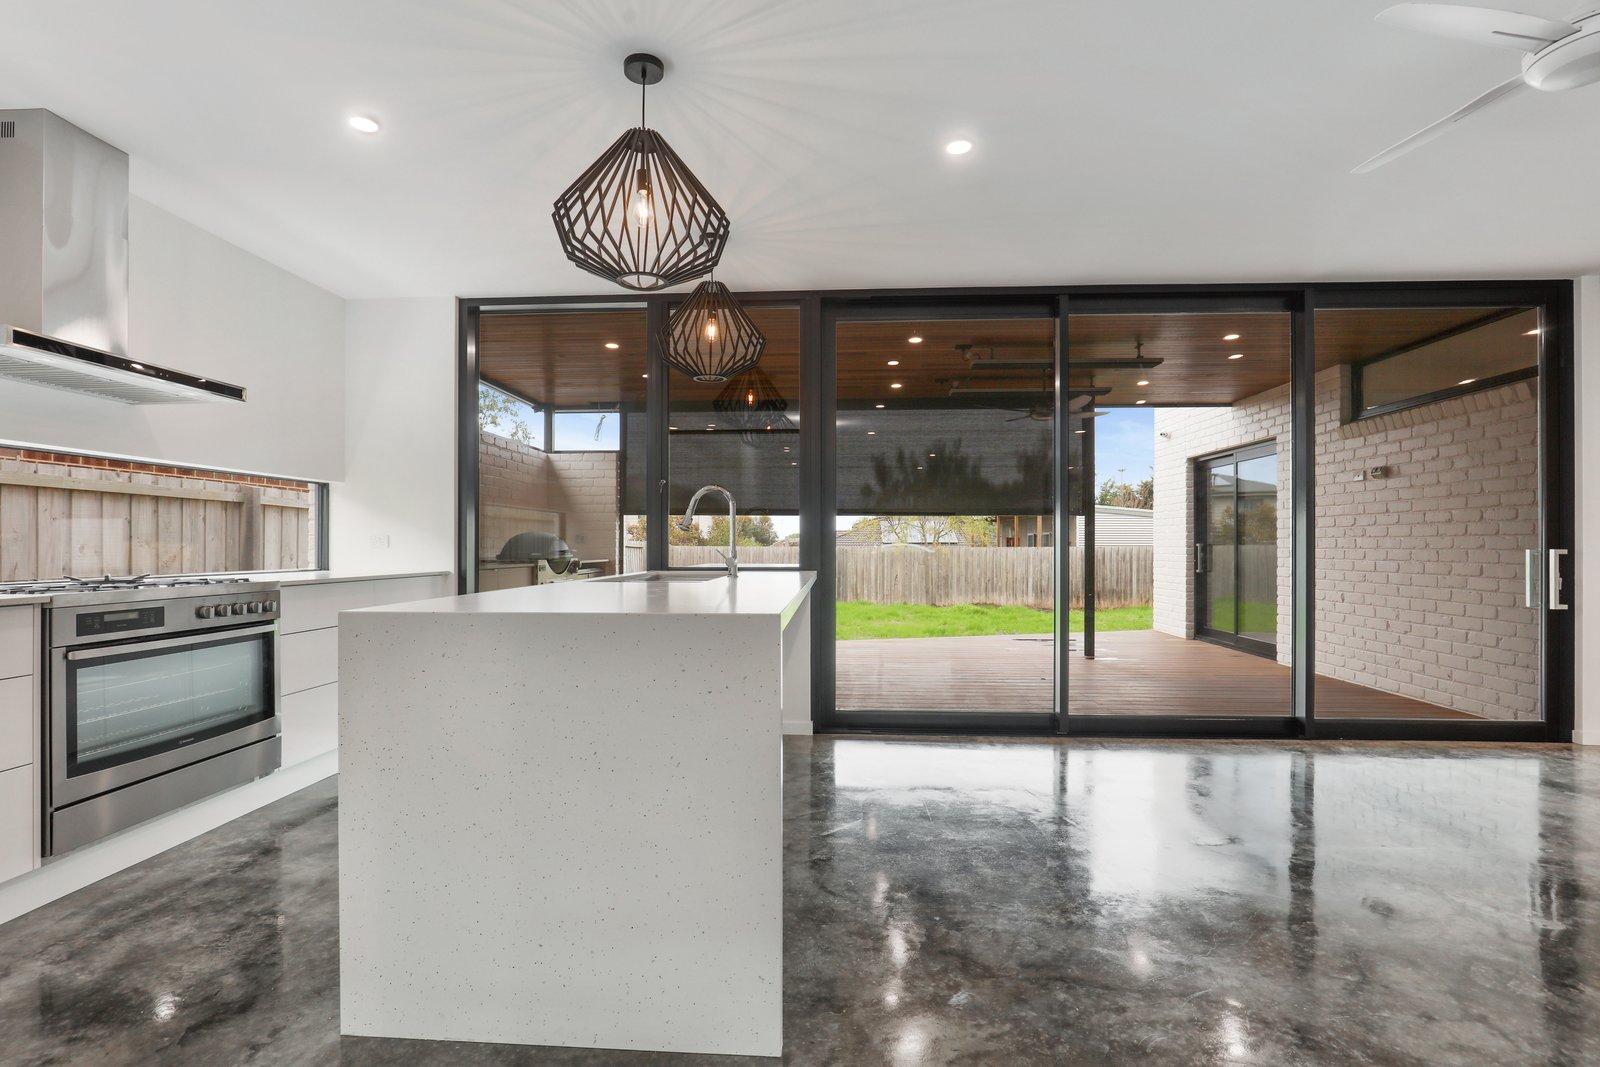 Kitchen, Engineered Quartz Counter, Glass Tile Backsplashe, Concrete Floor, Range, Pendant Lighting, White Cabinet, Recessed Lighting, and Undermount Sink  Tamara Crecsent by Inverloch 3996